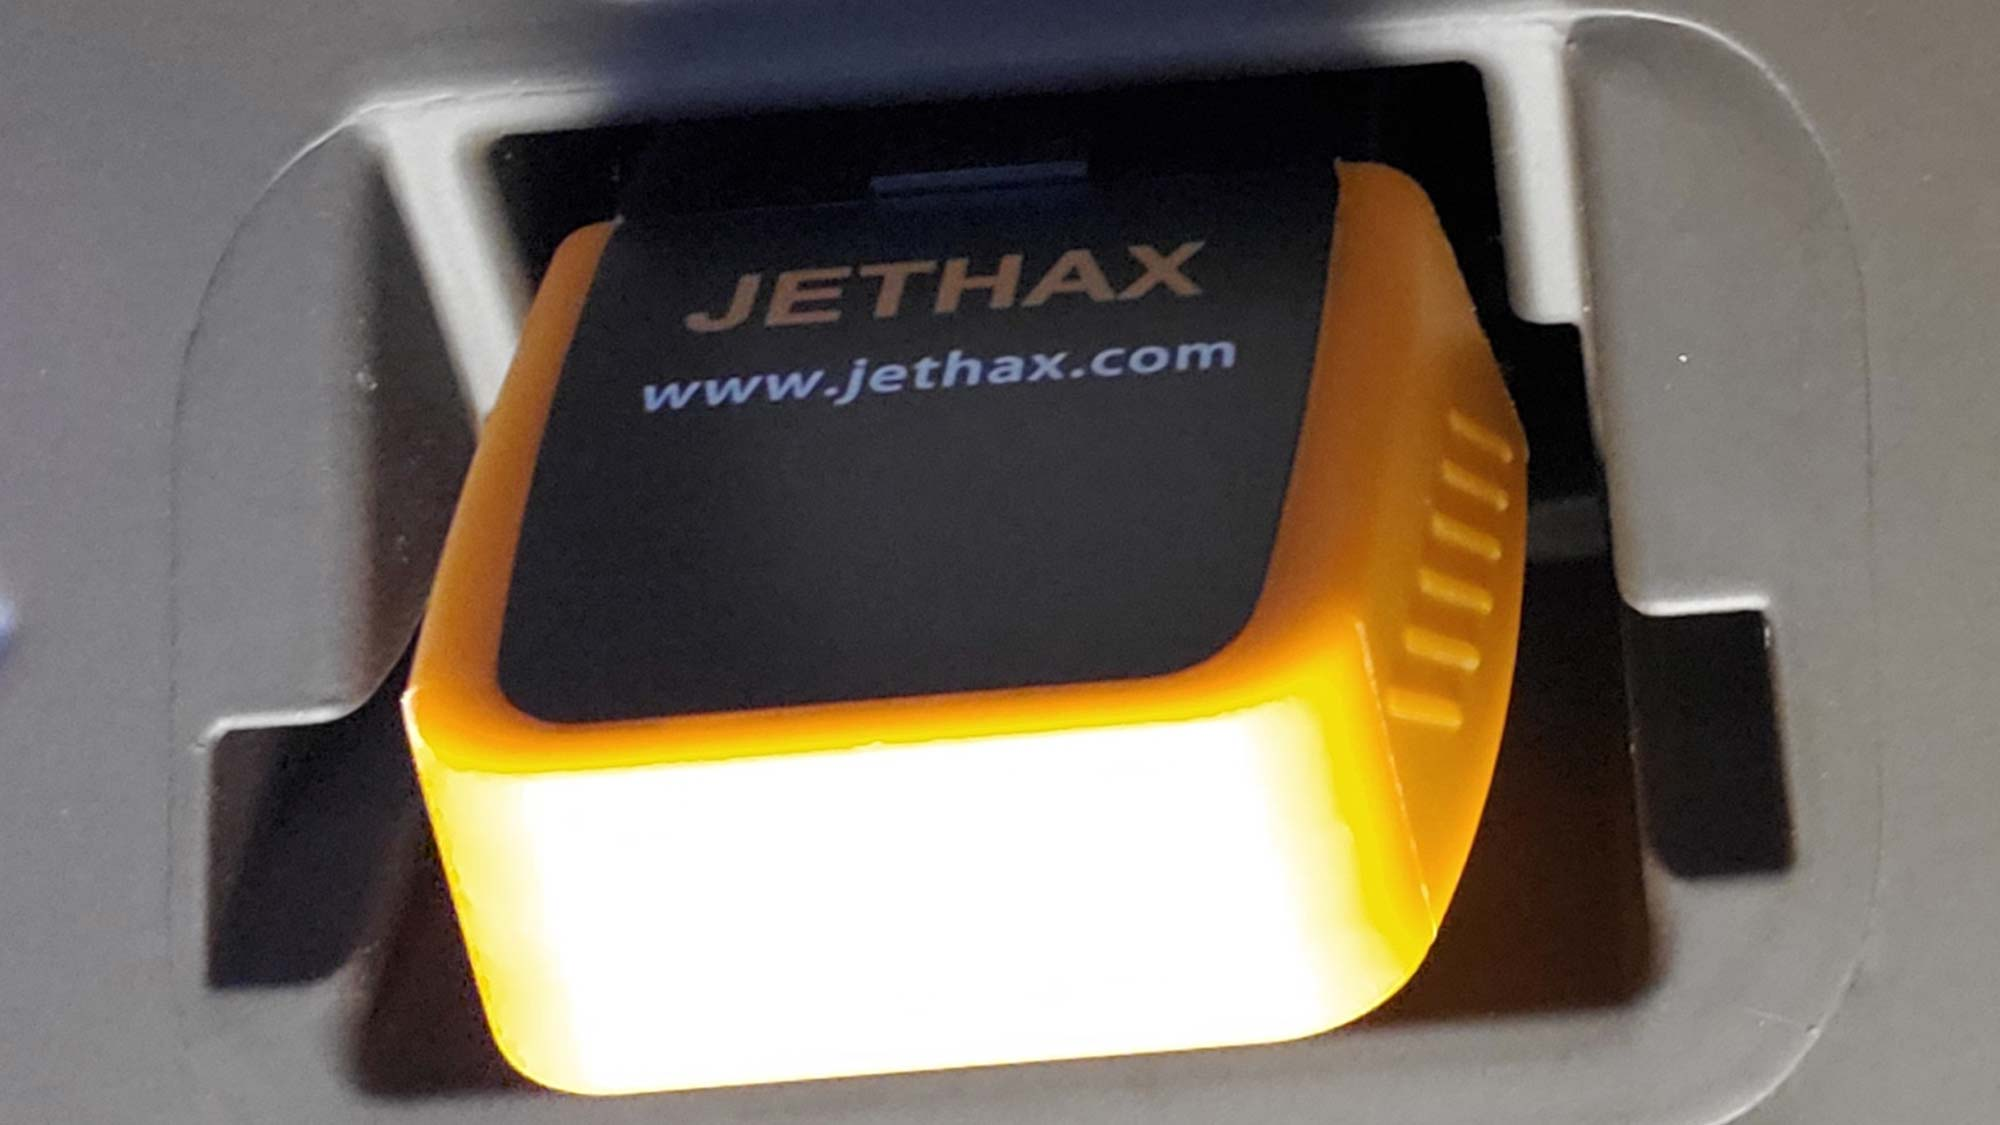 Best OBD2 scanners: Jethax OBD2 Scanner